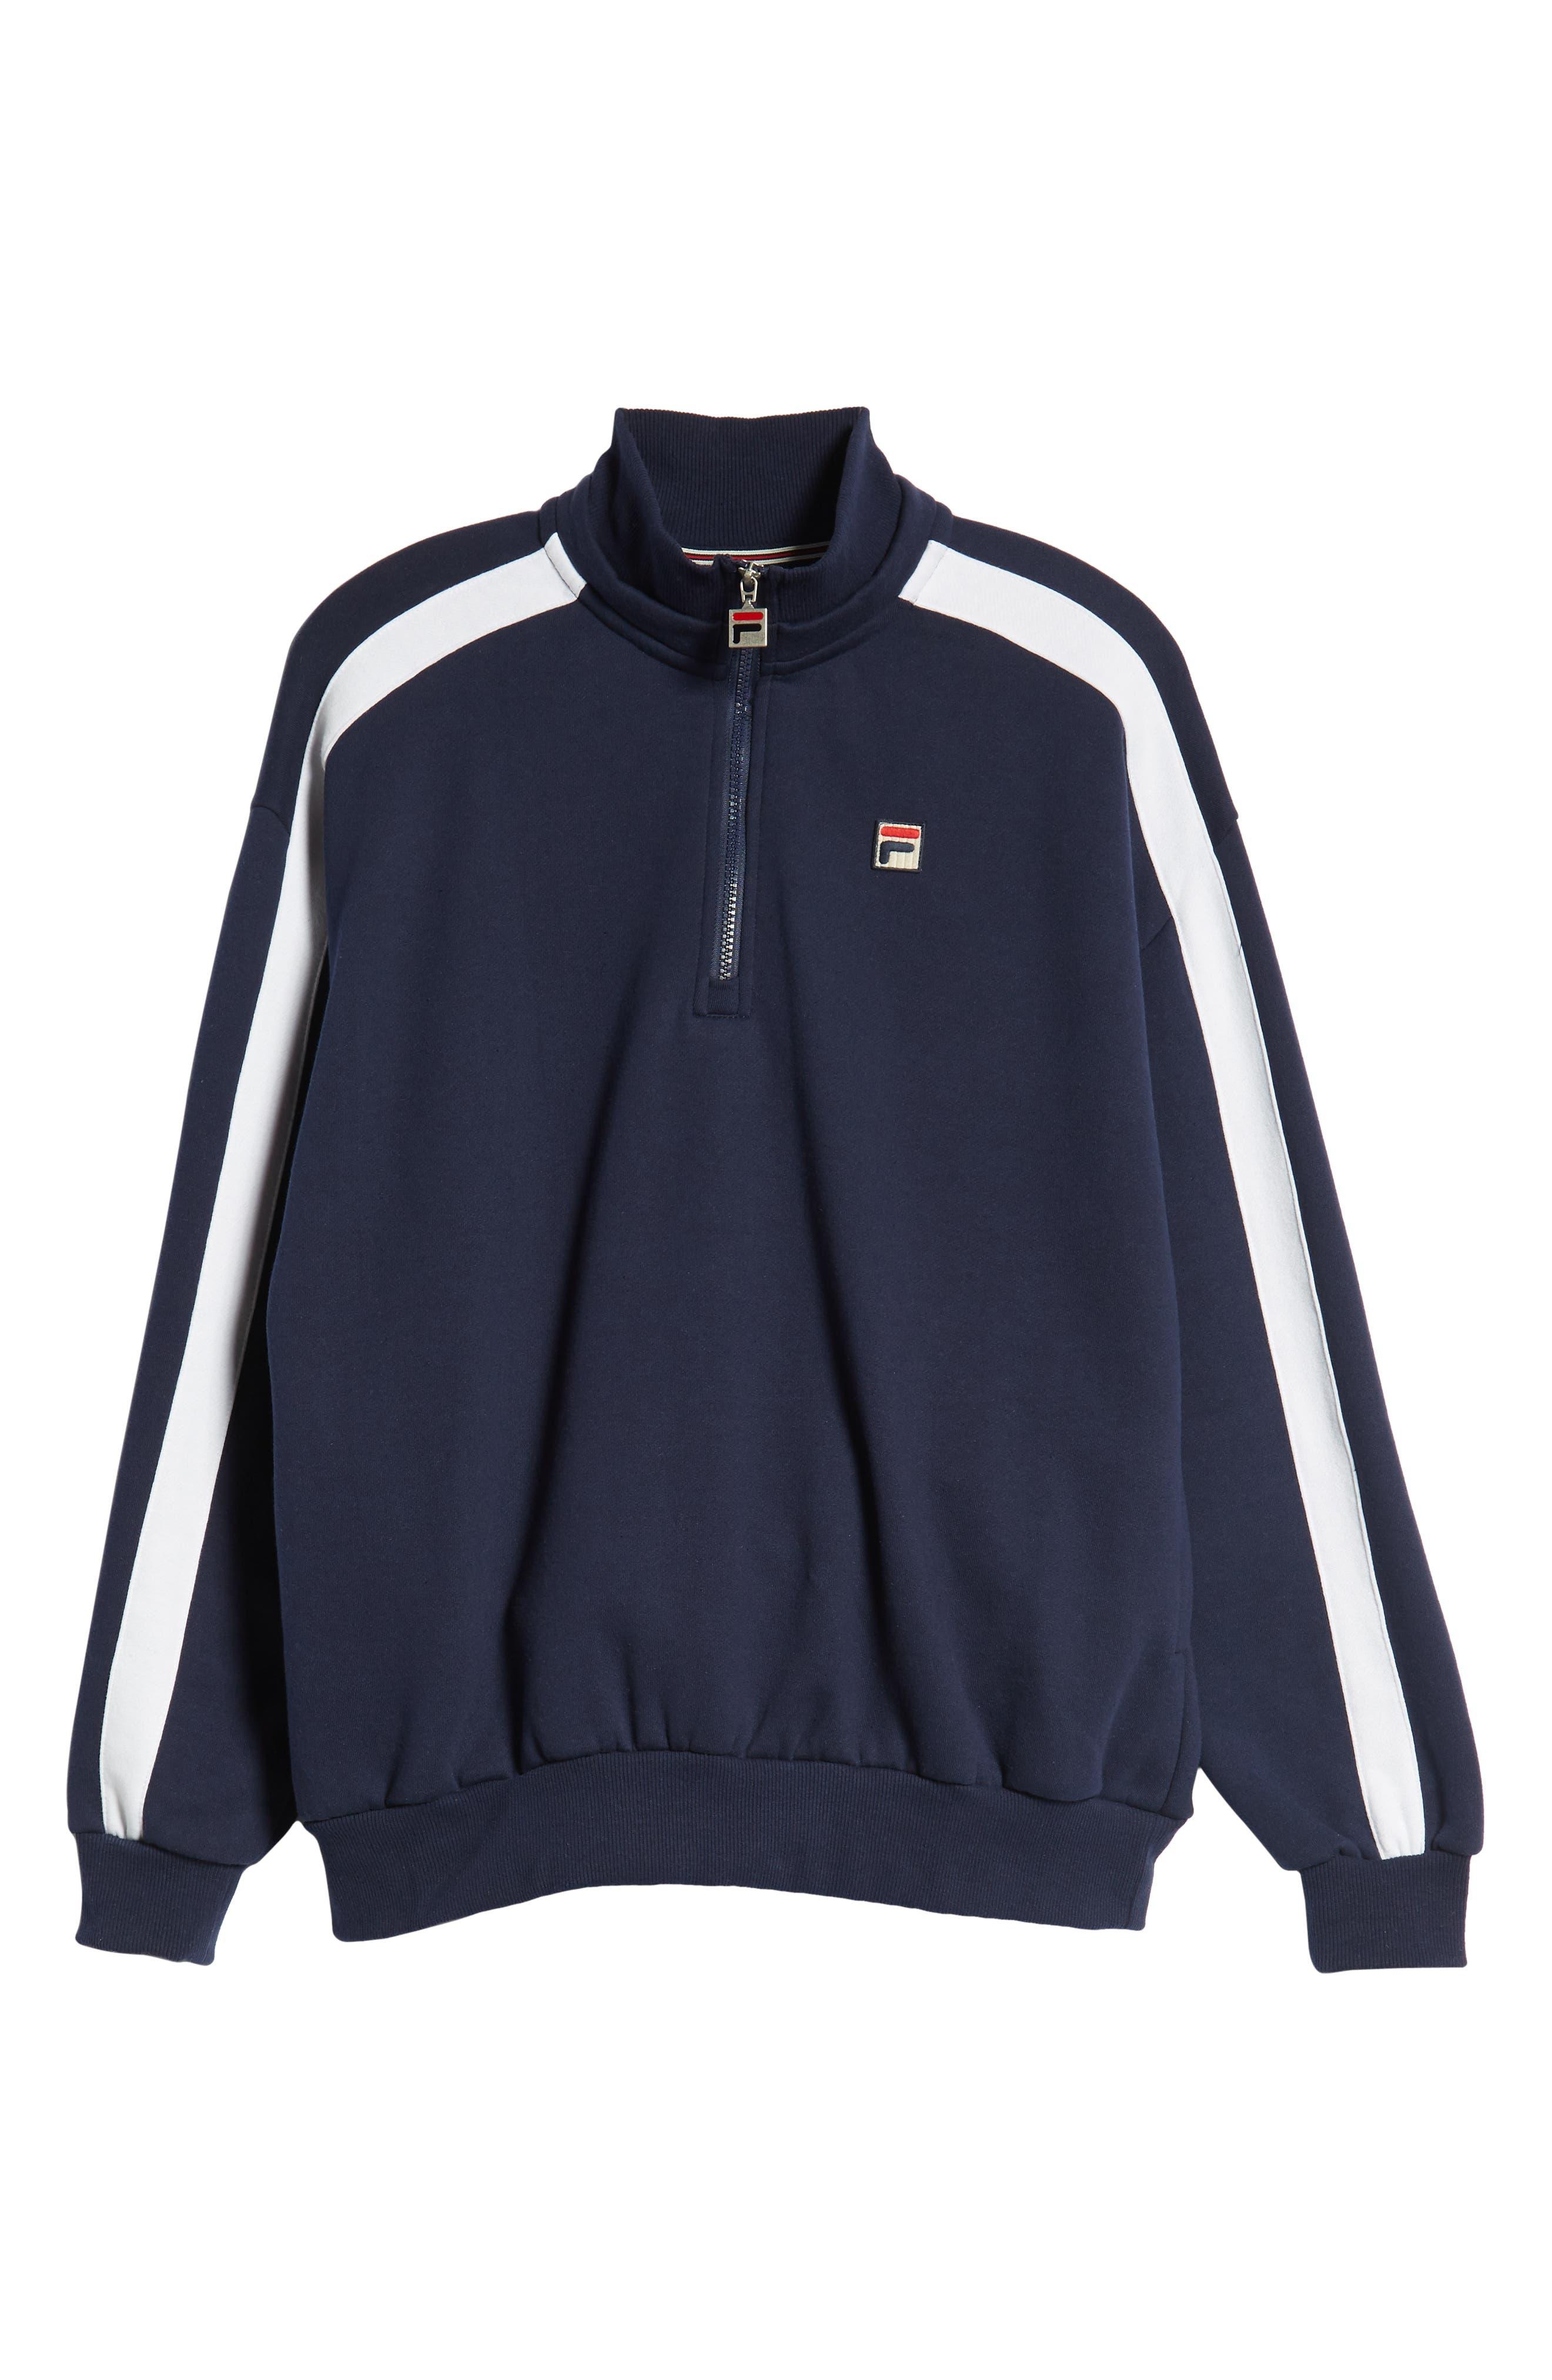 Quarter Zip Sweatshirt,                             Alternate thumbnail 6, color,                             PEACOAT/ WHITE/ CHINESE RED